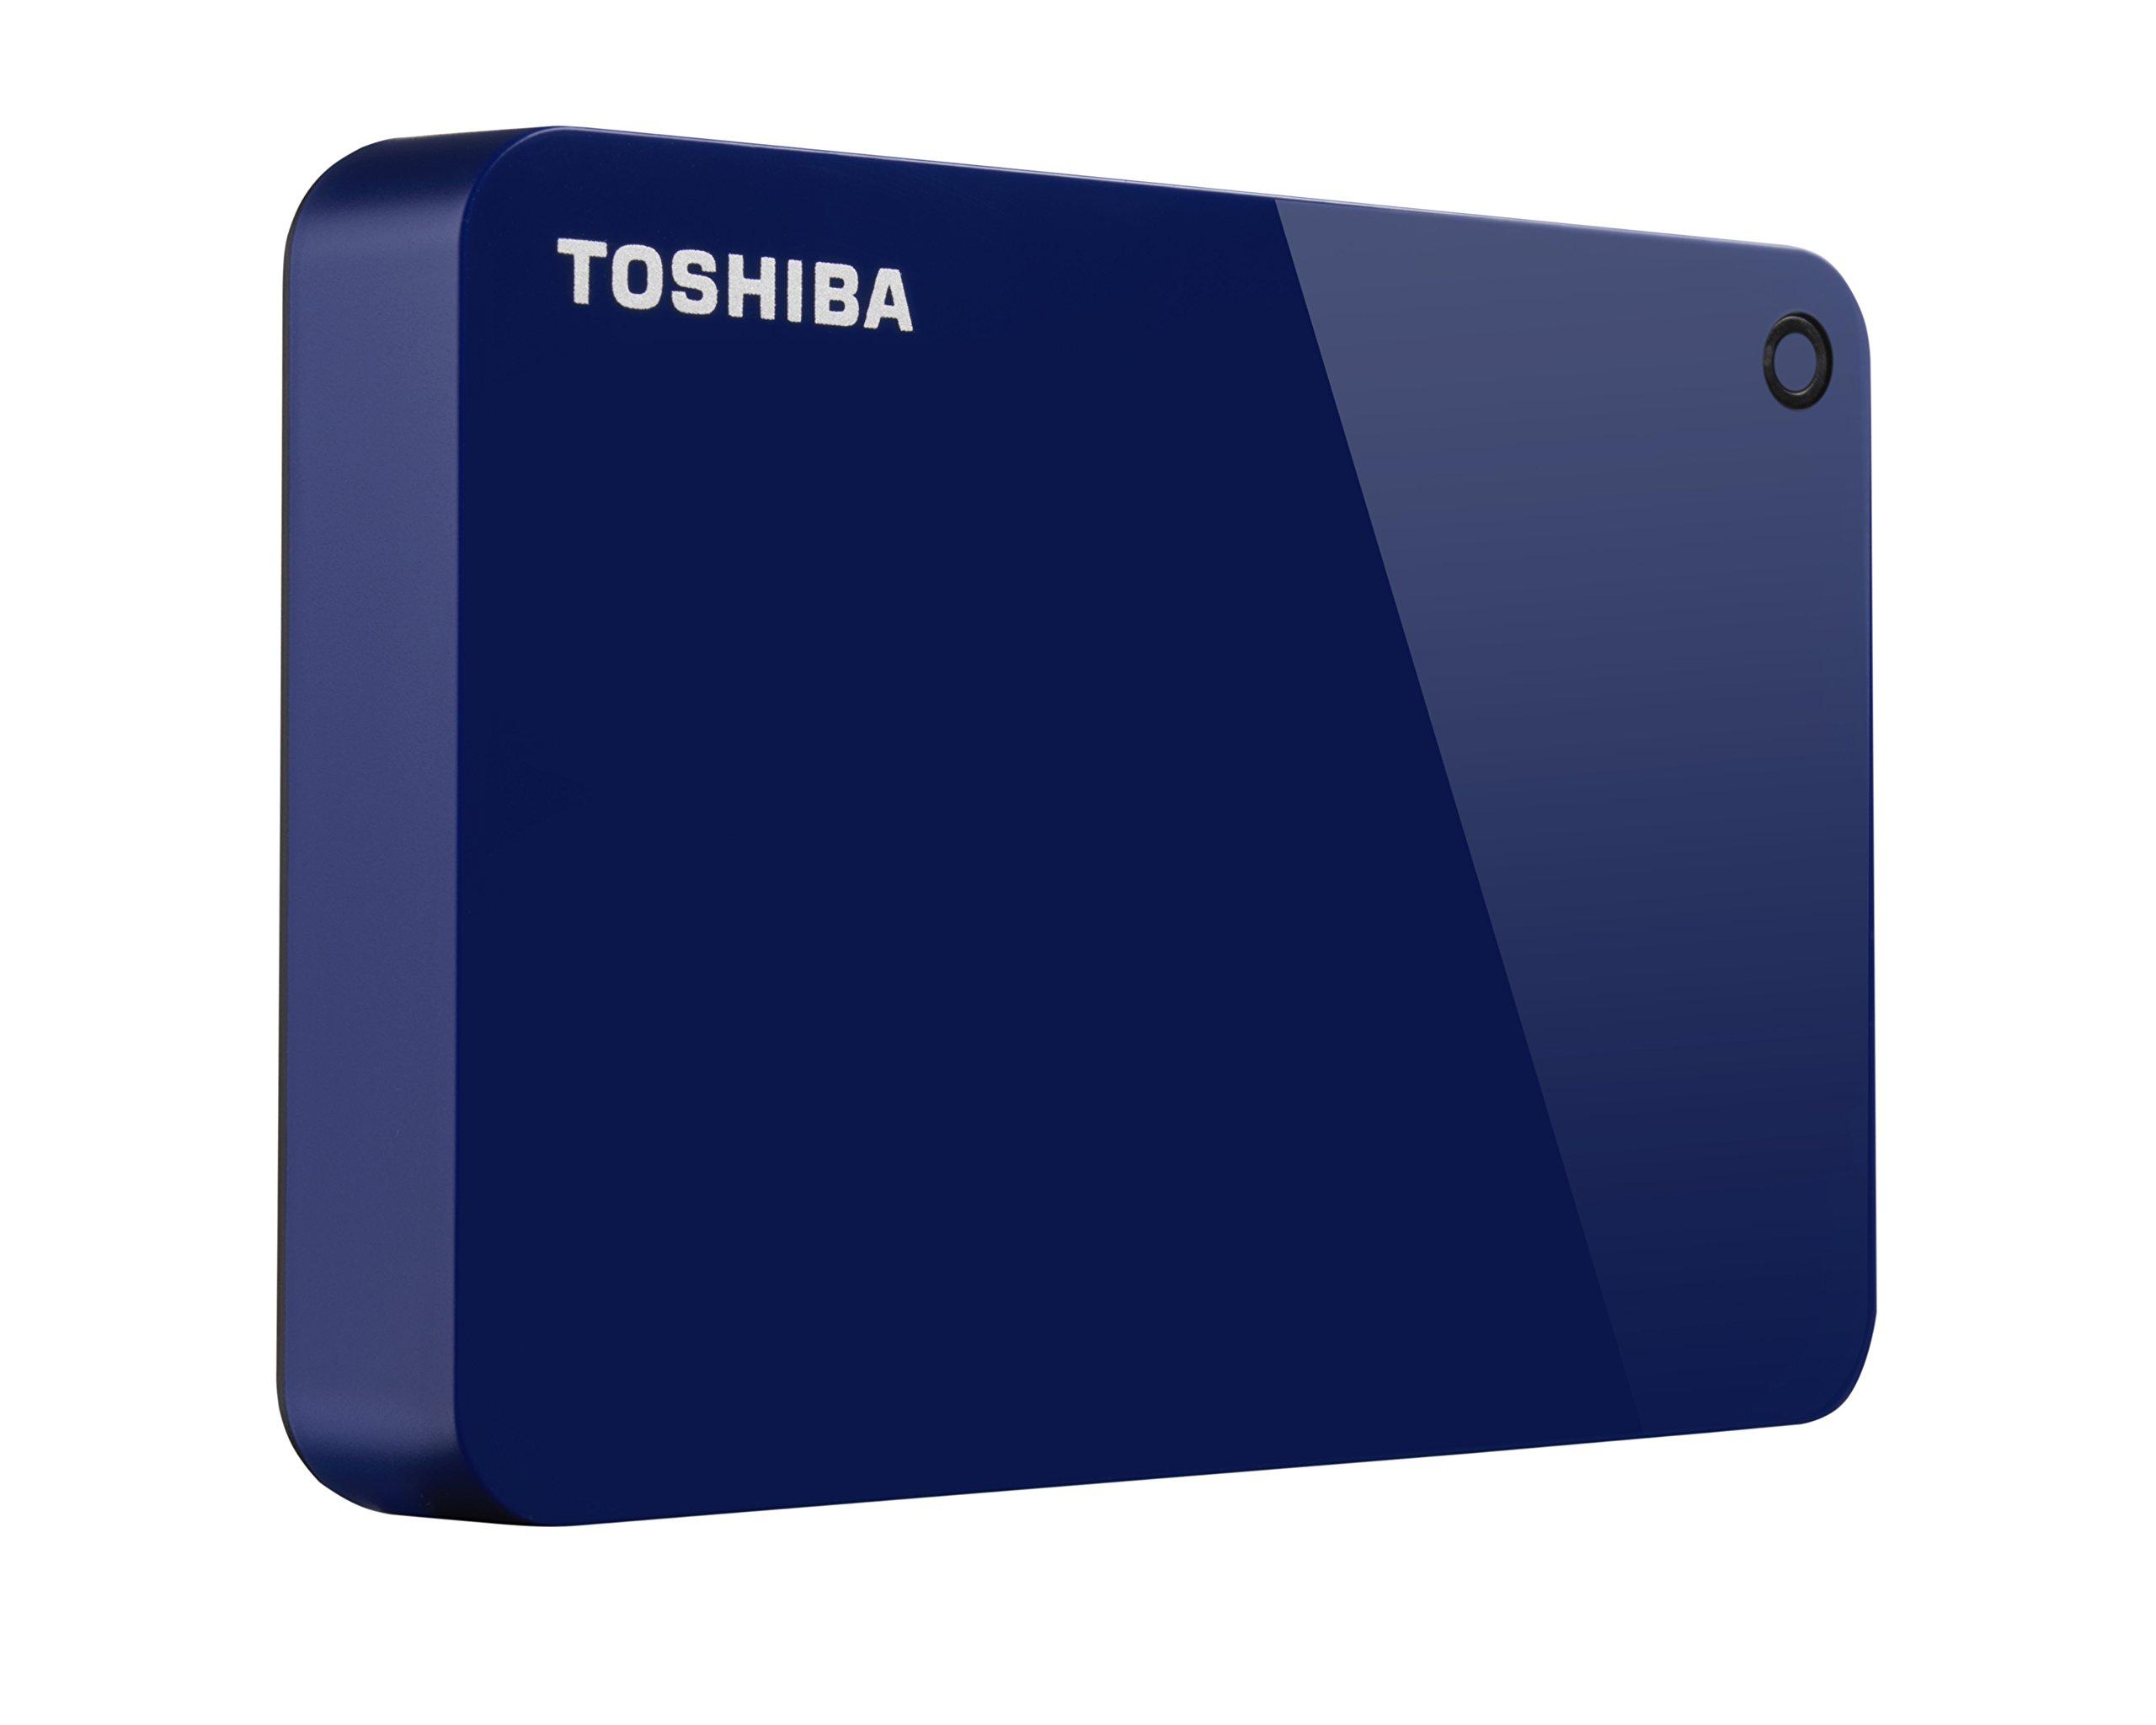 Toshiba Canvio Advance 4TB Portable External Hard Drive USB 3.0, Blue (HDTC940XL3CA) by Toshiba